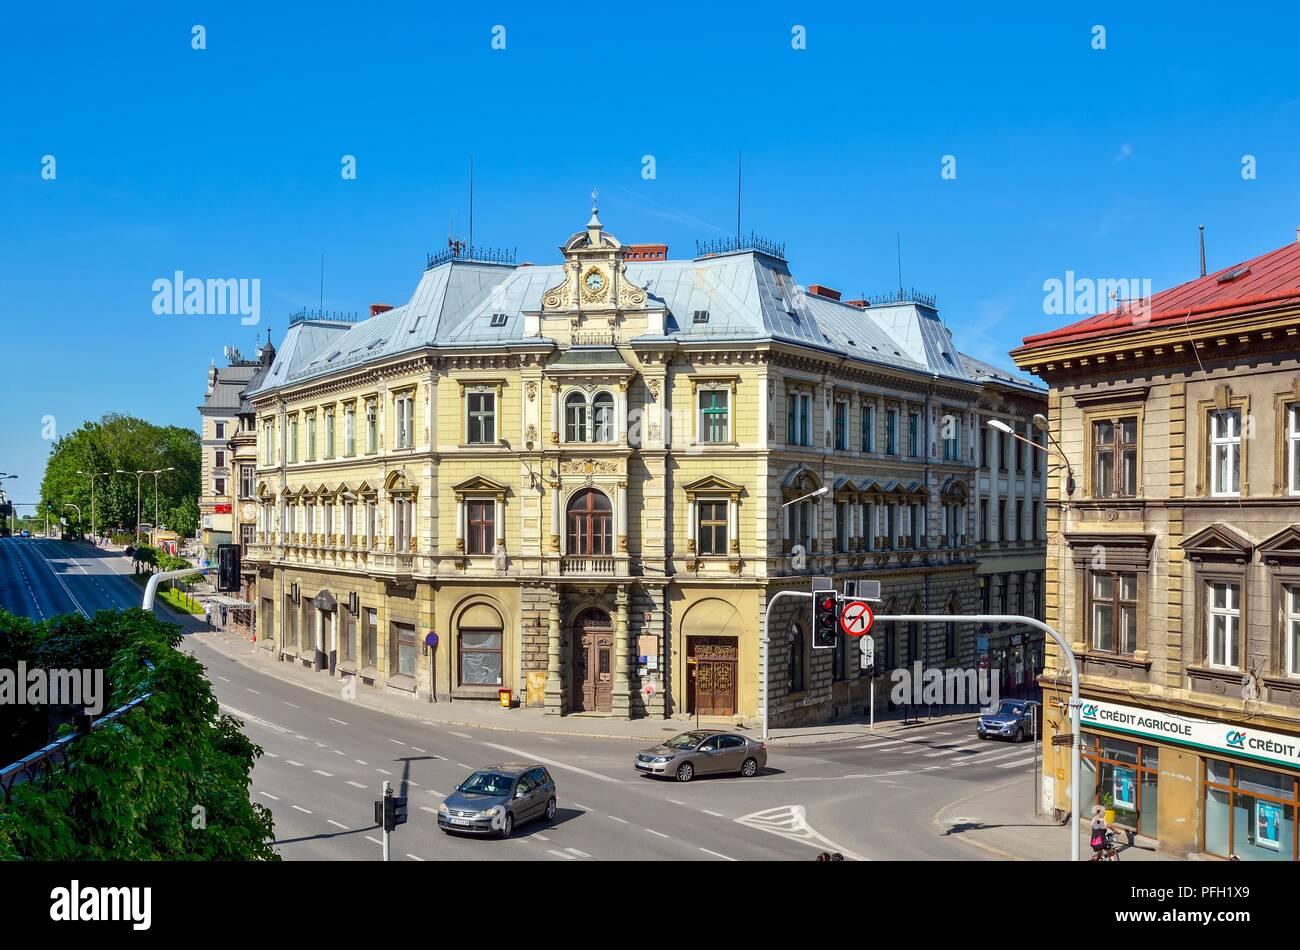 BIELSKO-BIALA, POLAND - MAY 13, 2018: Old tenements in the center of Bielsko-Biala, Poland. - Stock Image